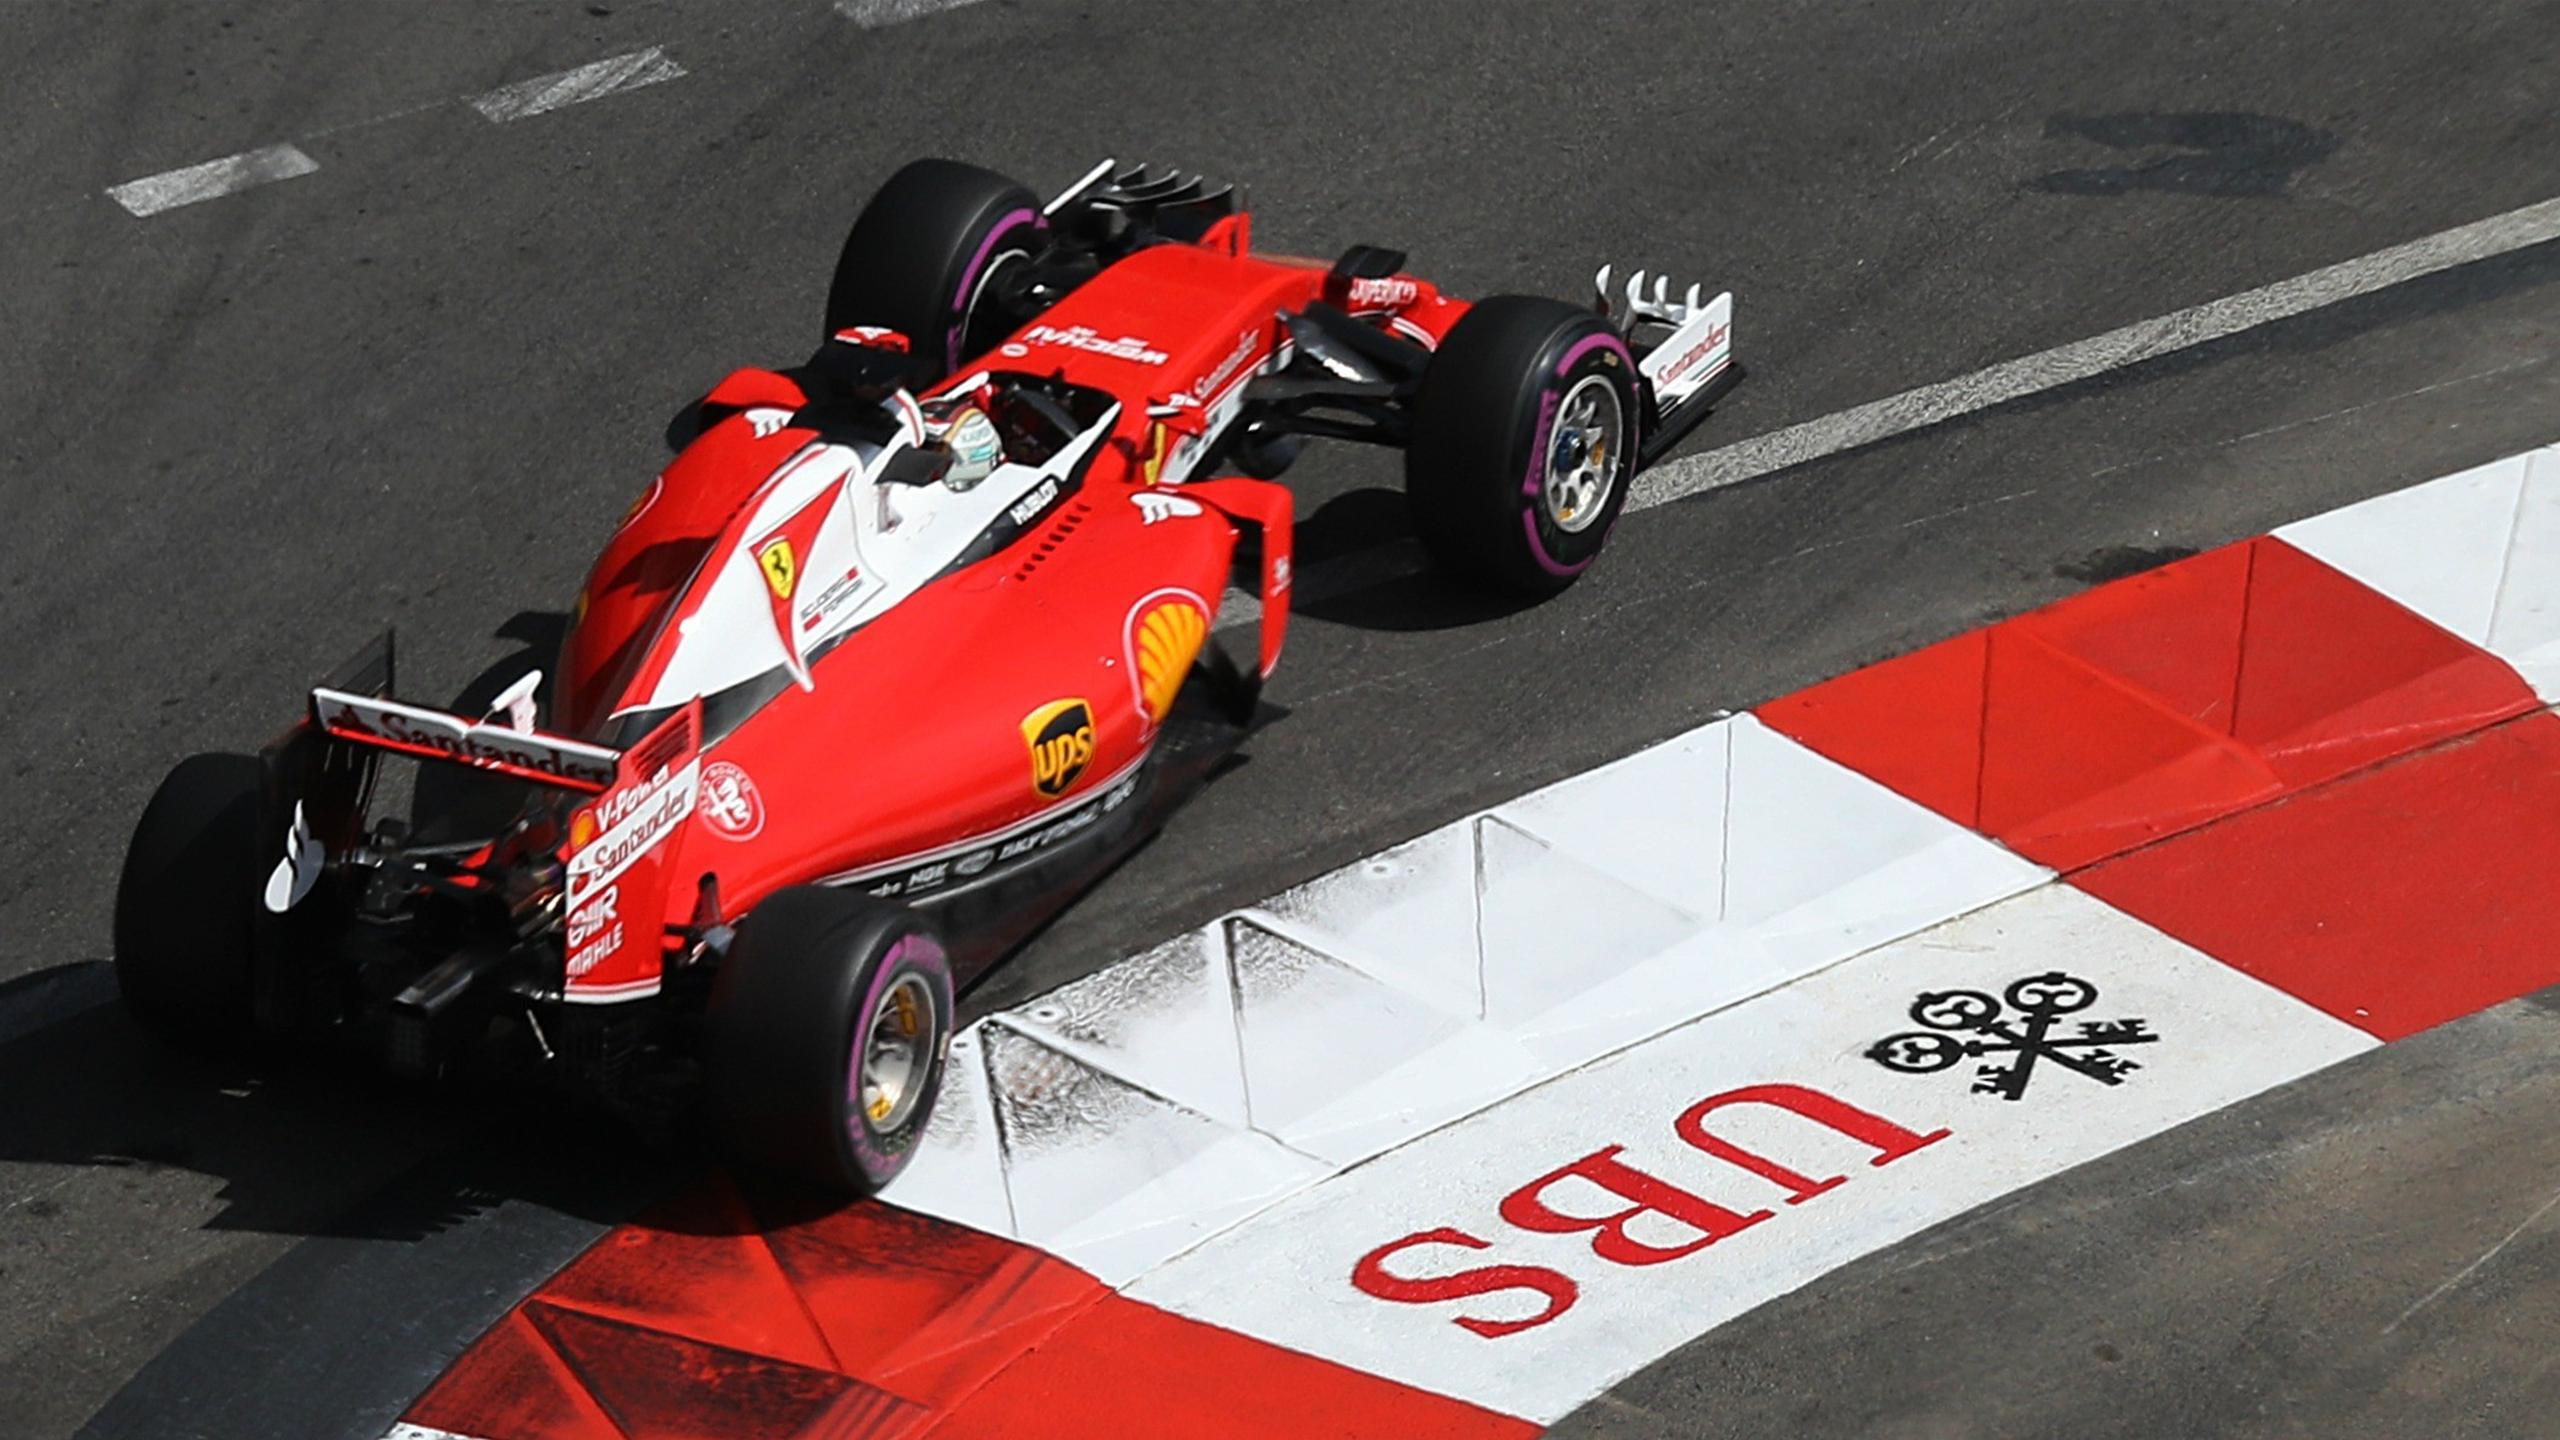 Sebastian Vettel (Ferrari) - GP of Monaco 2016